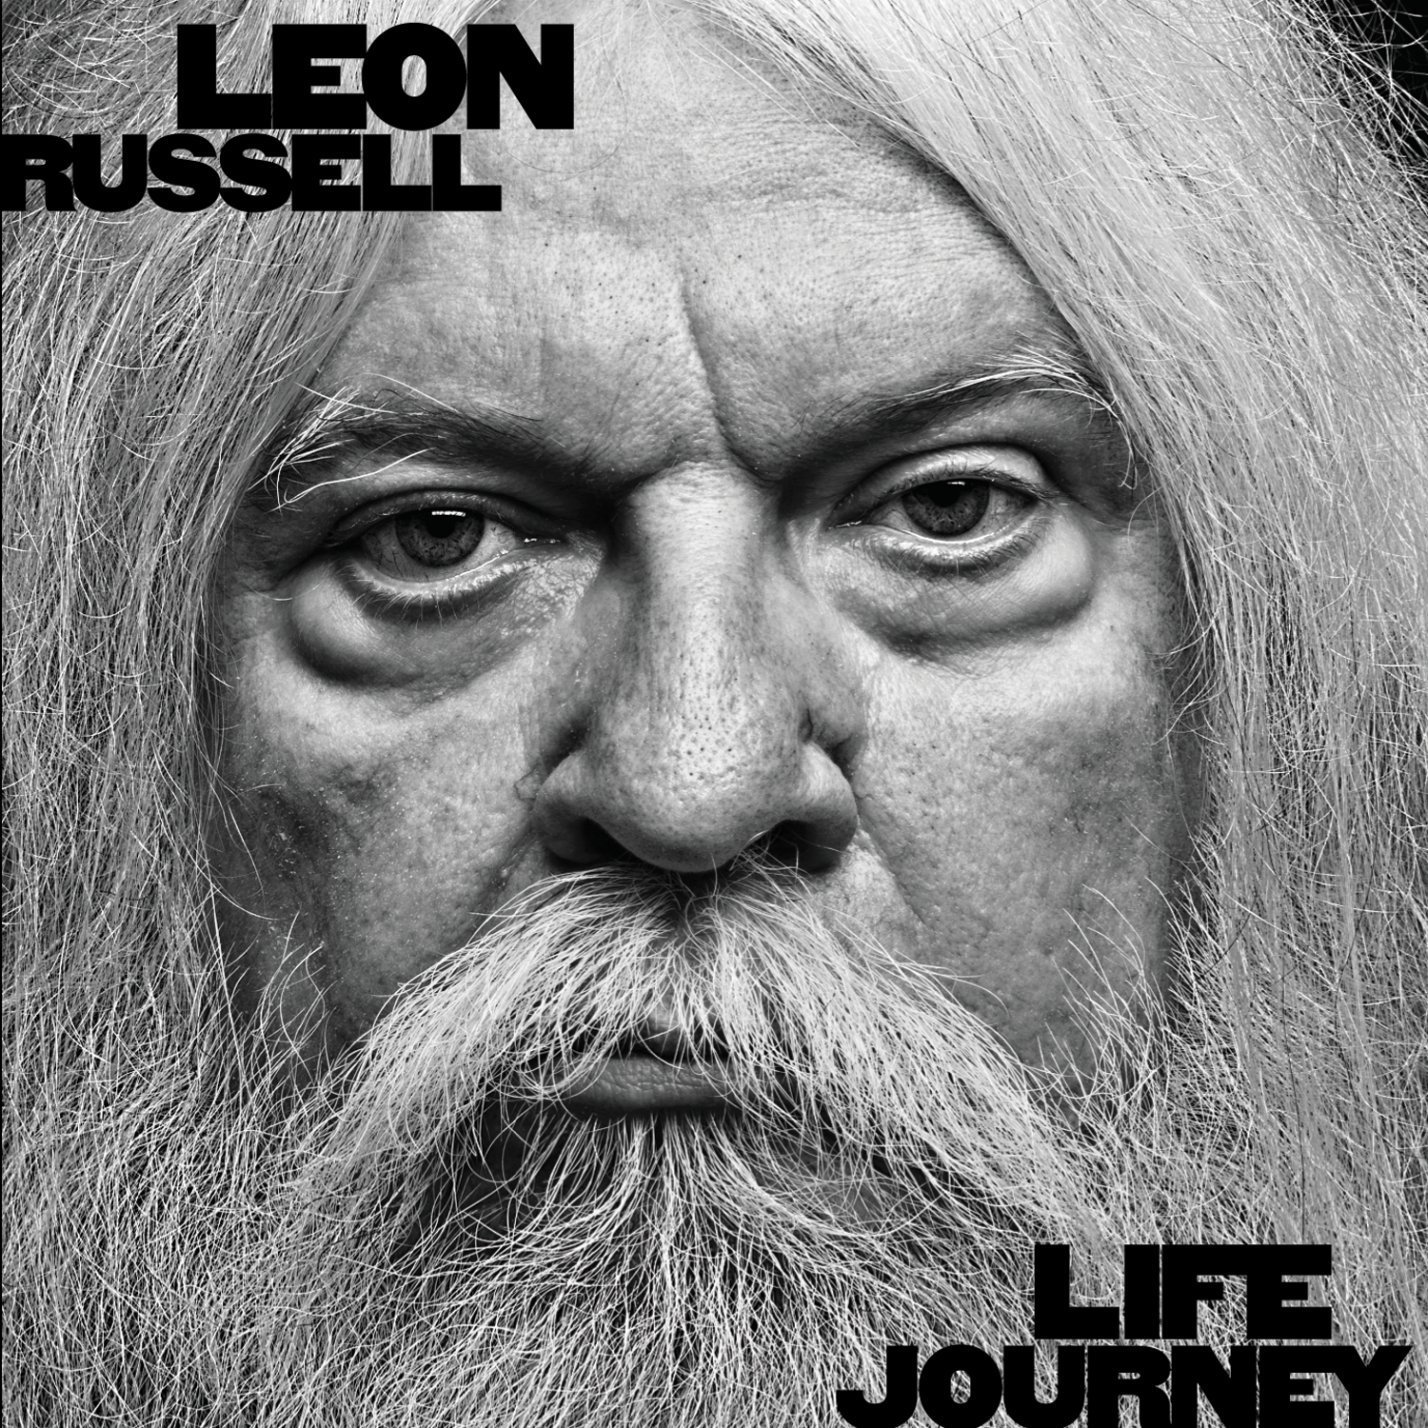 life journey leon russel.jpg